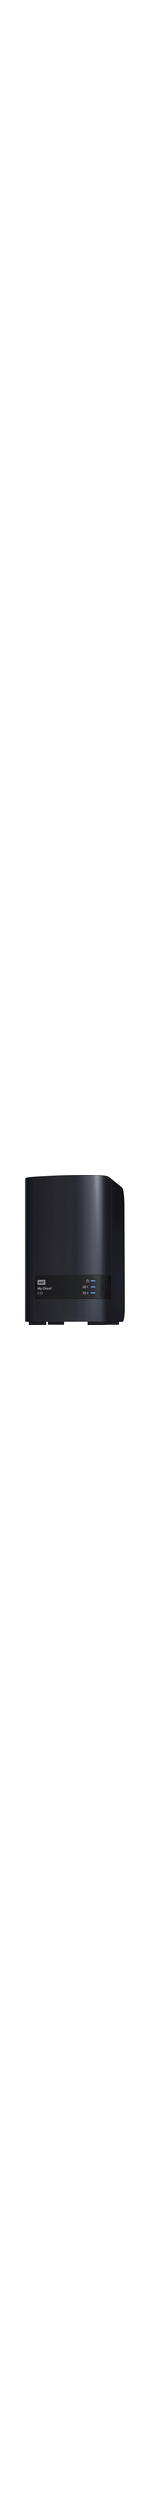 WD My Cloud EX2 WDBVBZ0080JCH-EESN 2 x Total Bays NAS Server - Tower